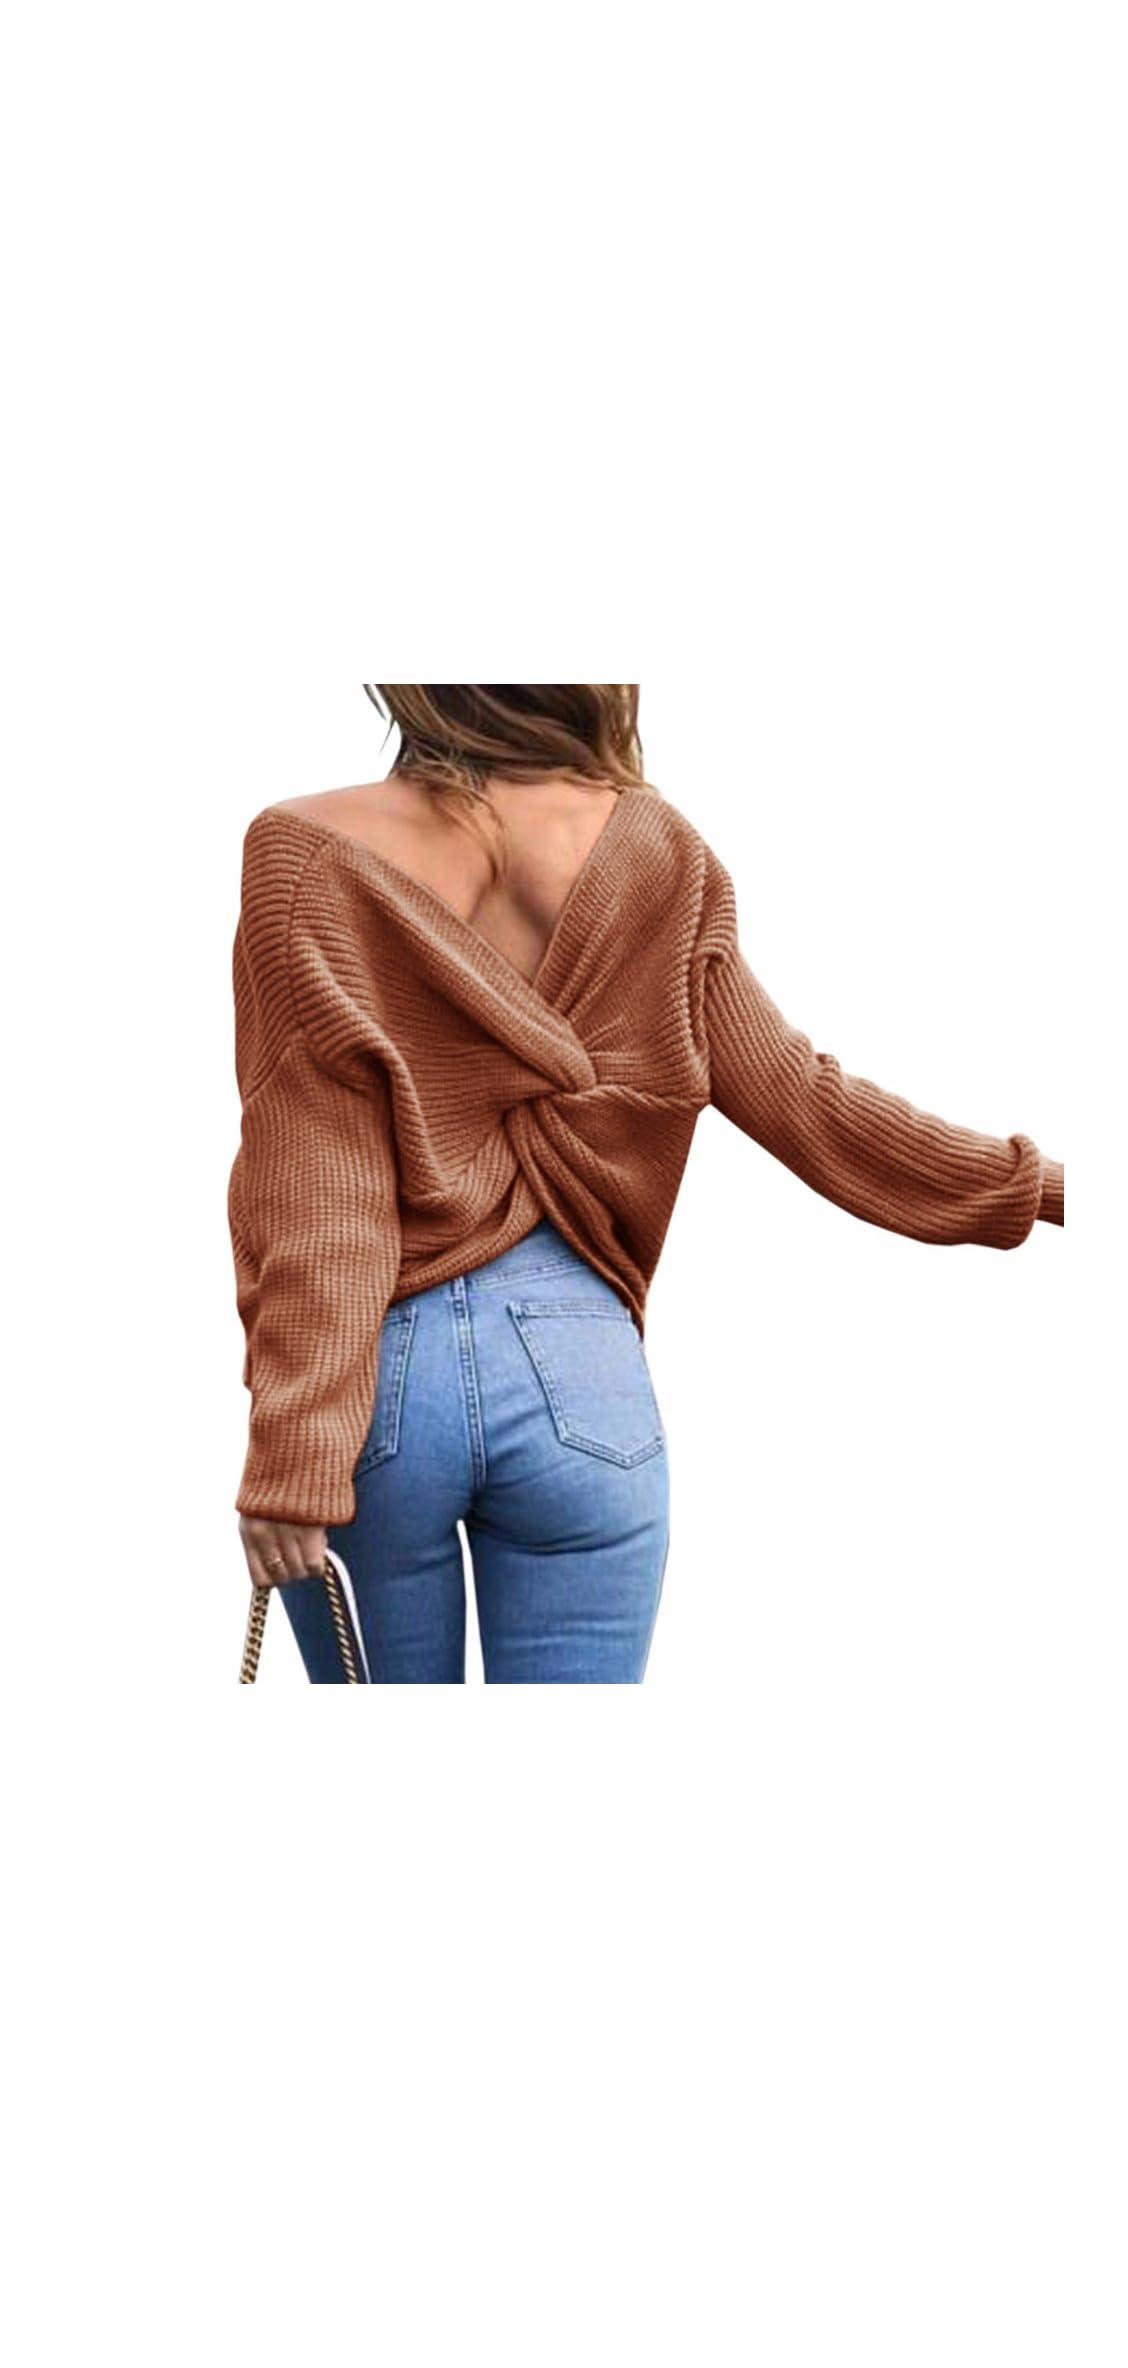 Women's Casual V Neck Criss Cross Backless Long Sleeve